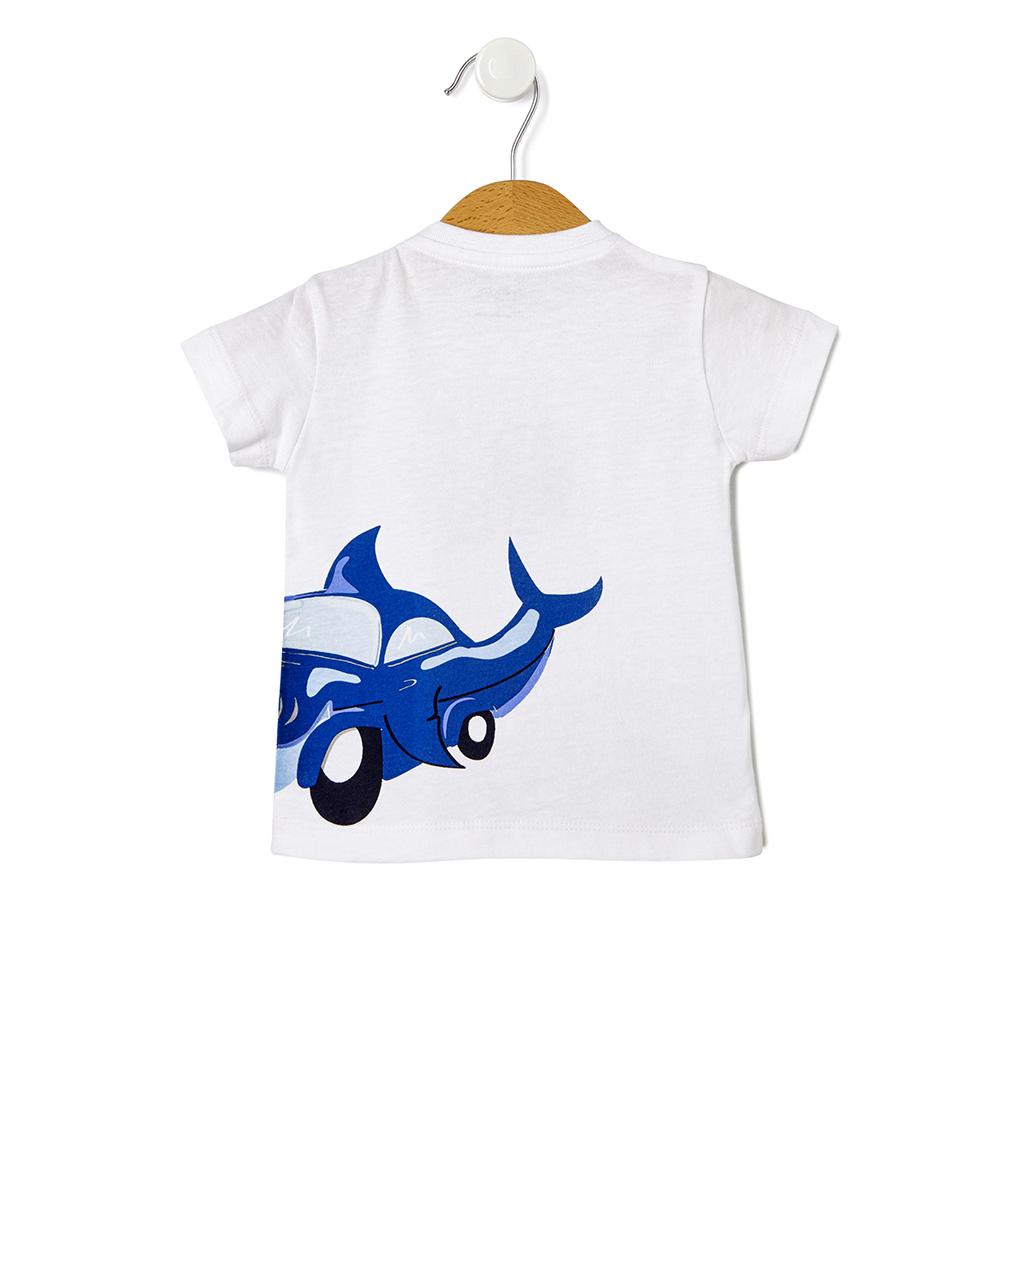 T-shirt stampa squalo - Prénatal